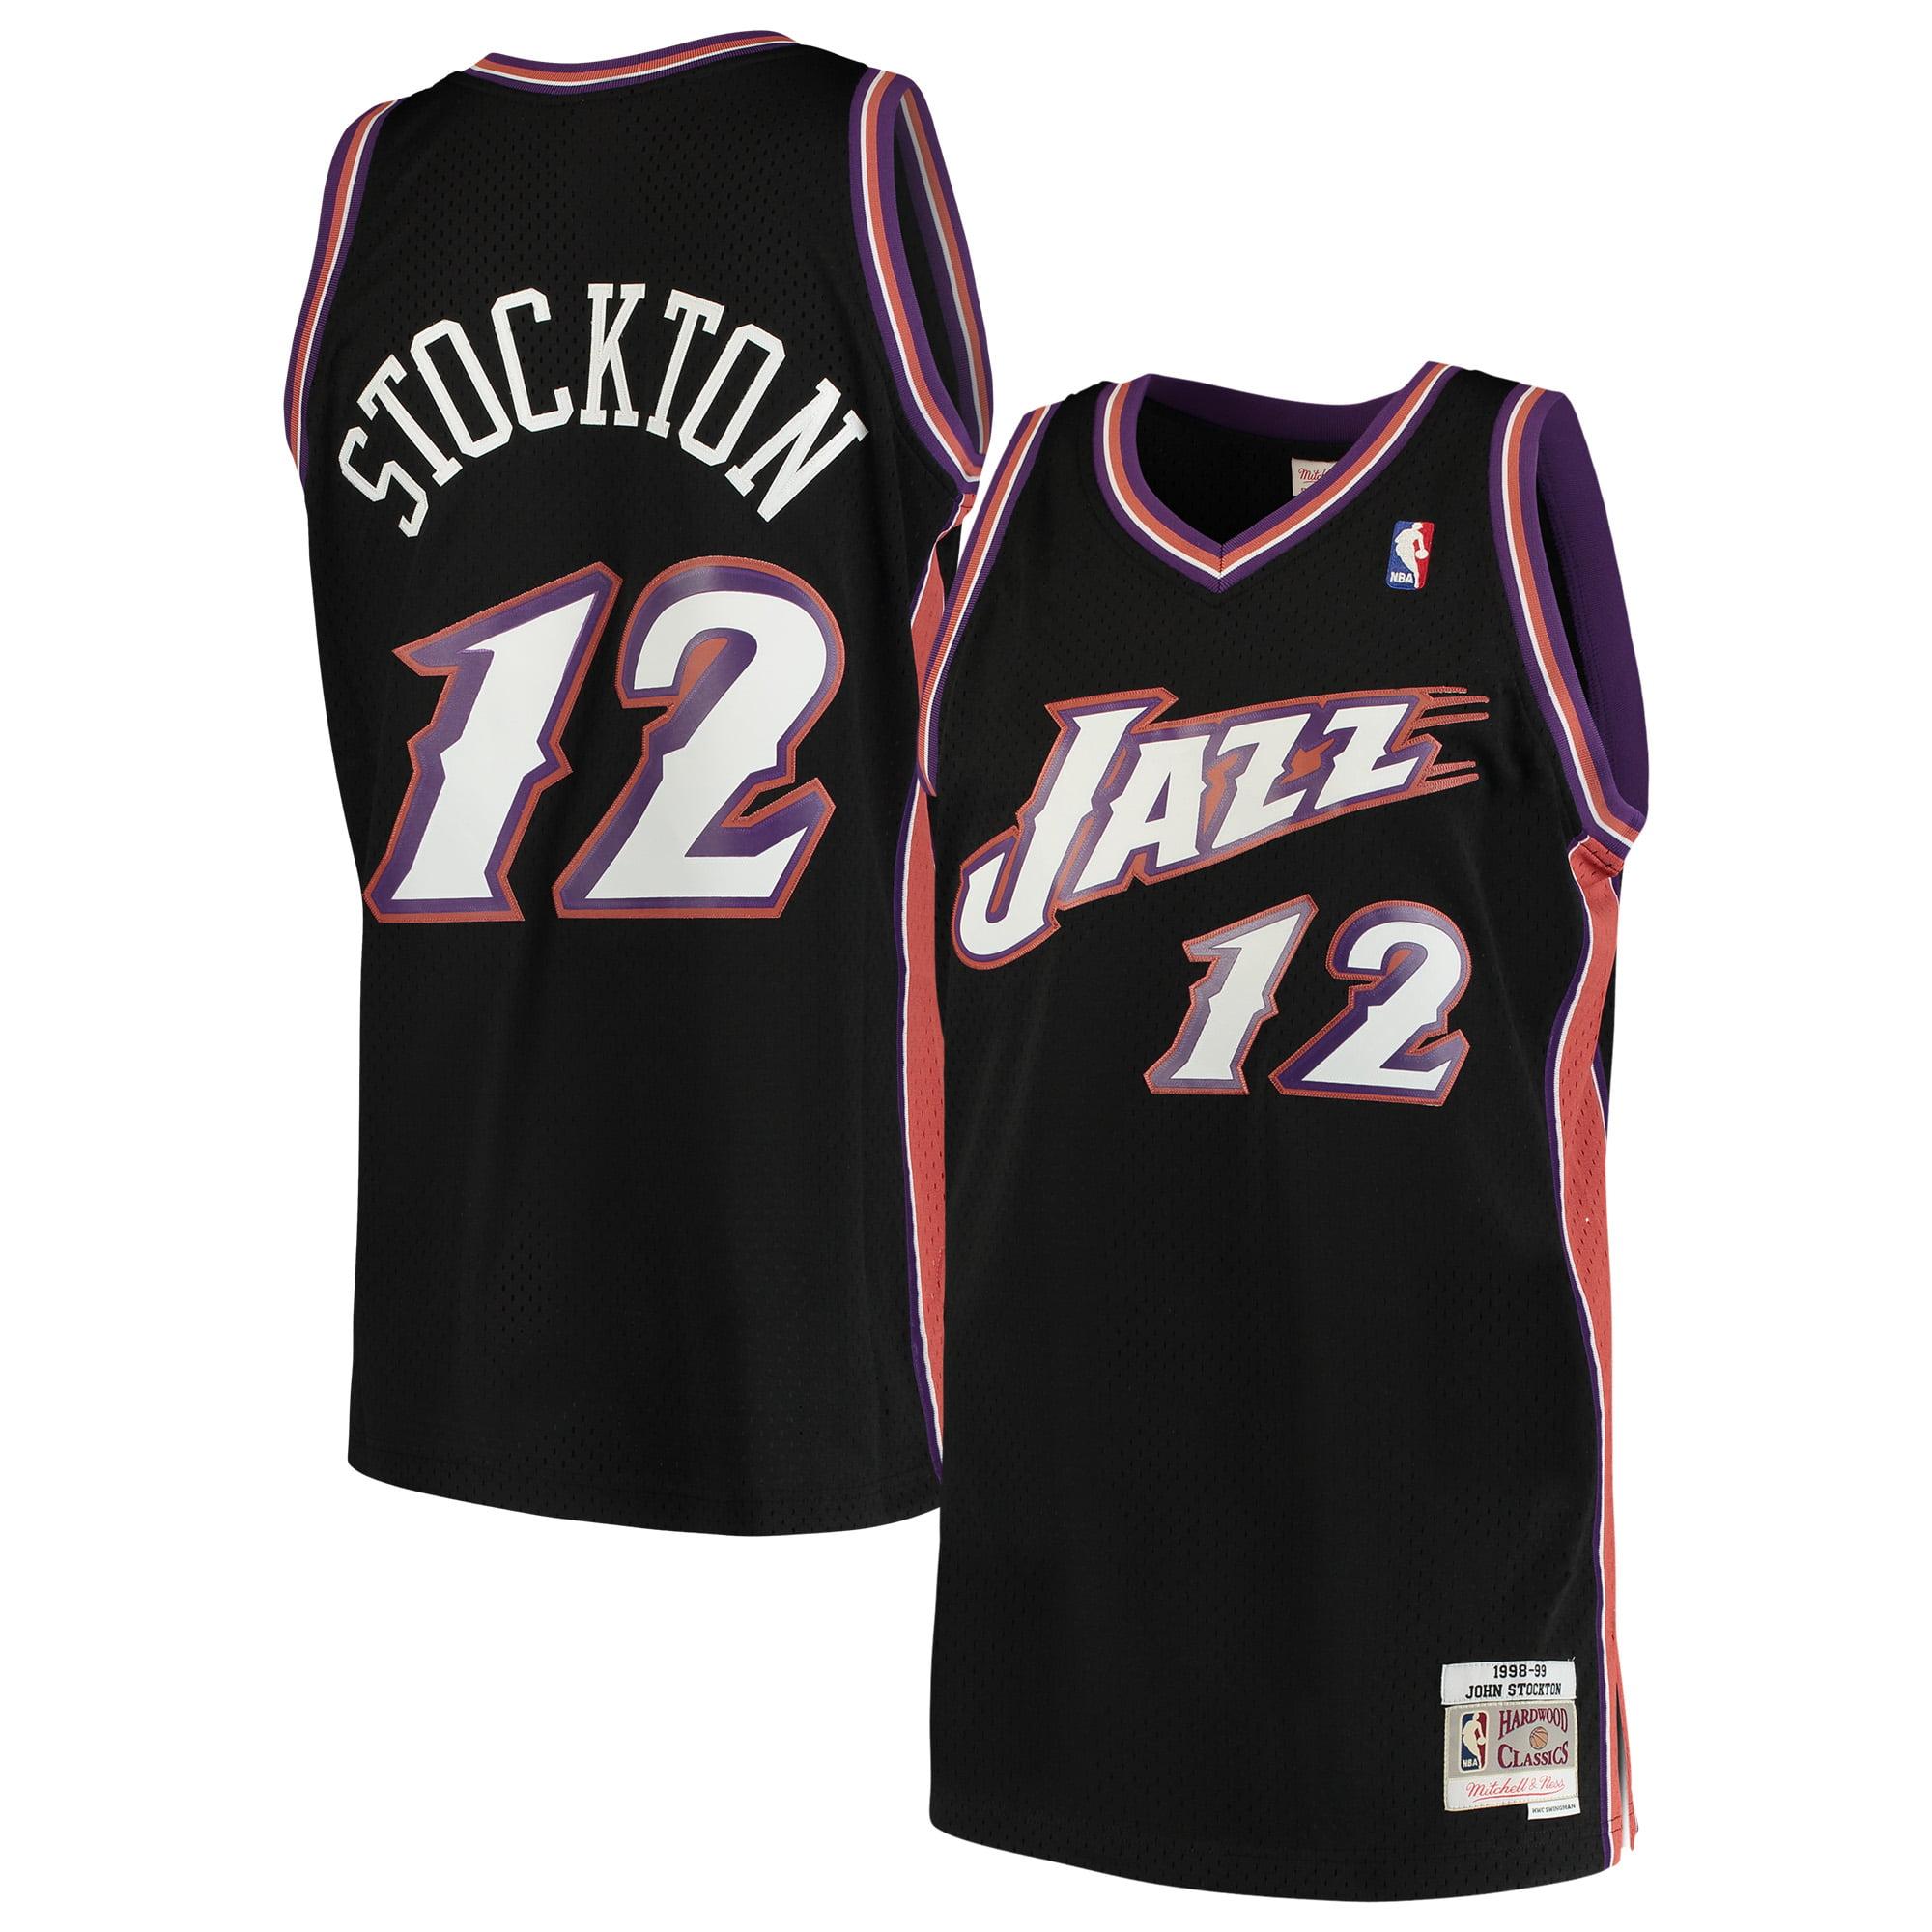 timeless design c120c 17c9a John Stockton Utah Jazz Mitchell & Ness 1998-99 Hardwood Classics Swingman  Jersey - Black